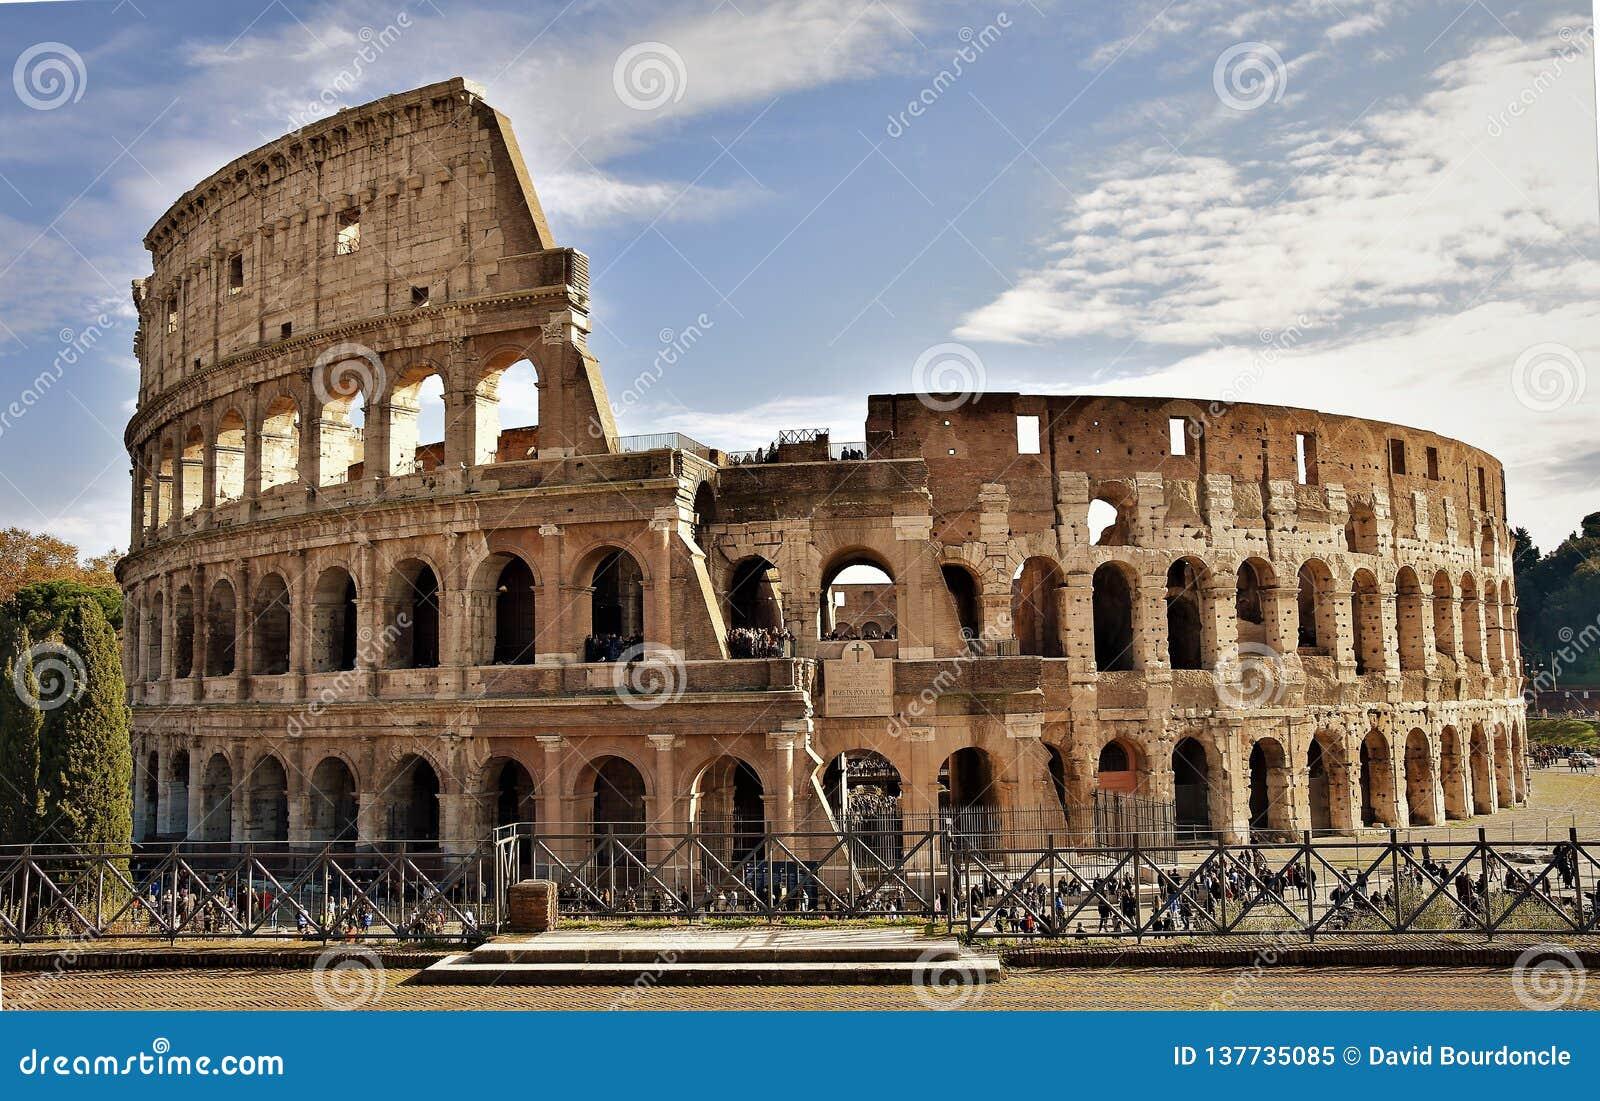 Il colosseo罗马,意大利